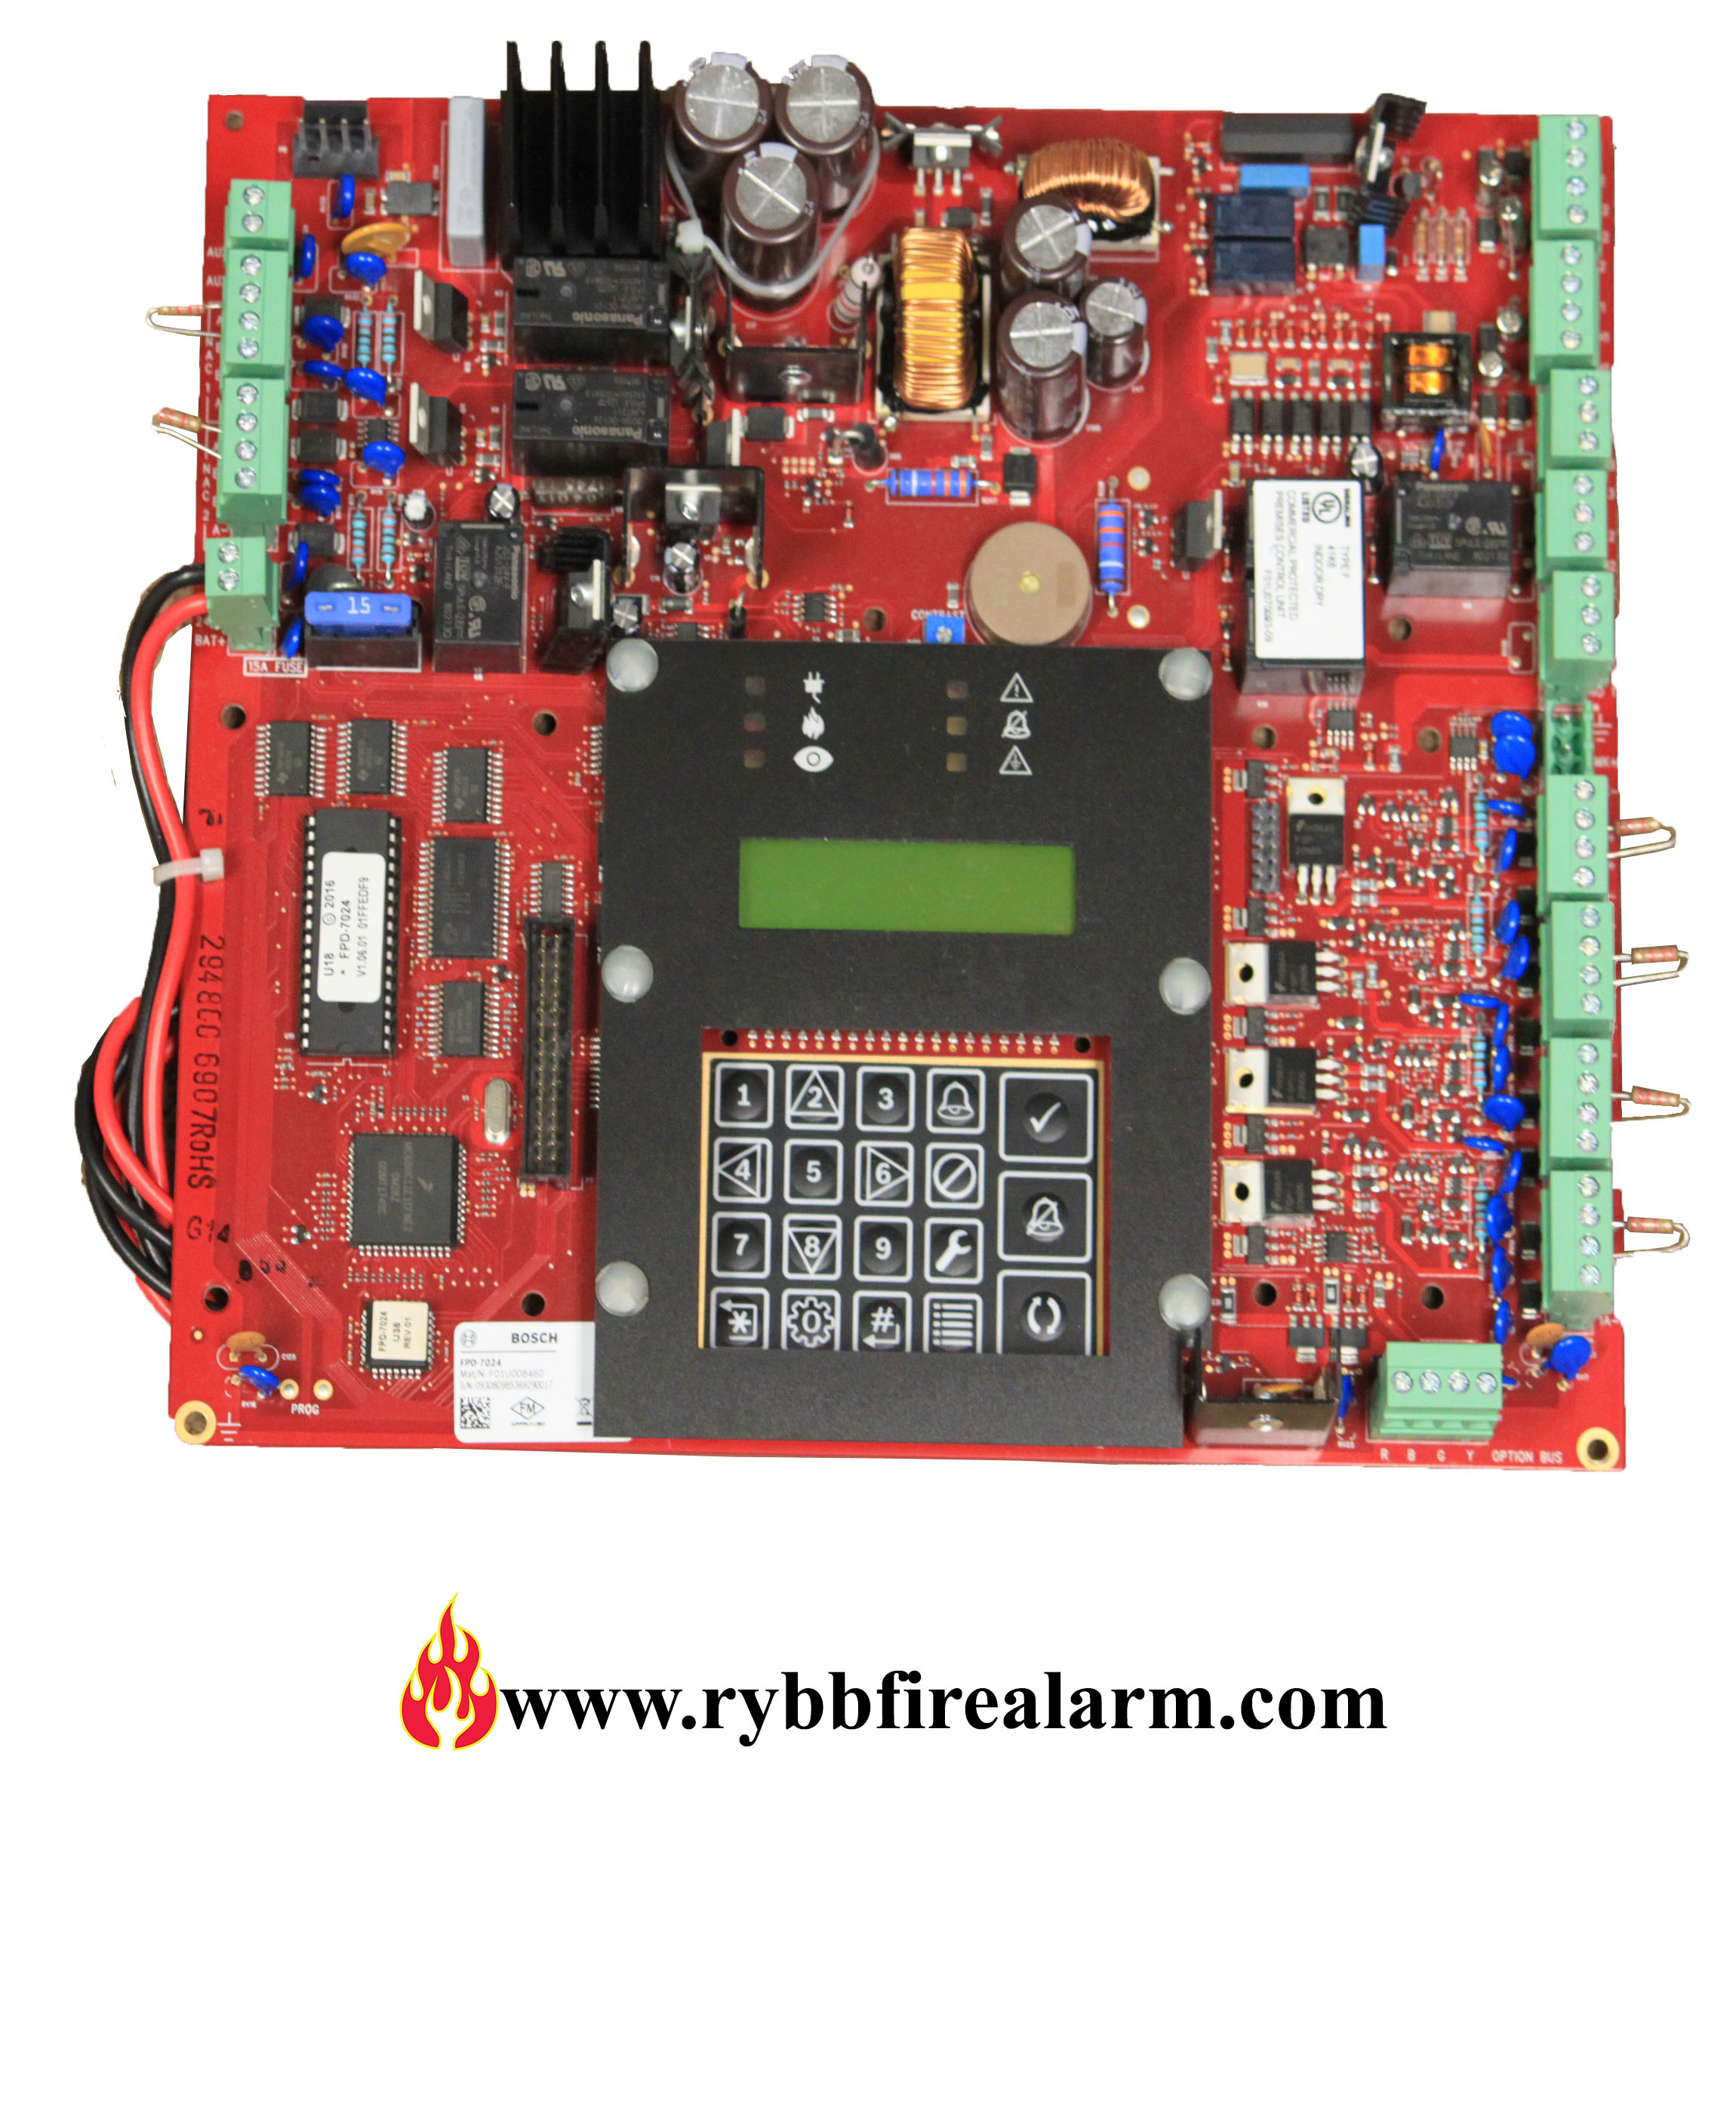 Bosch Fpd 7024 Fire Alarm Control Panel New W Cab